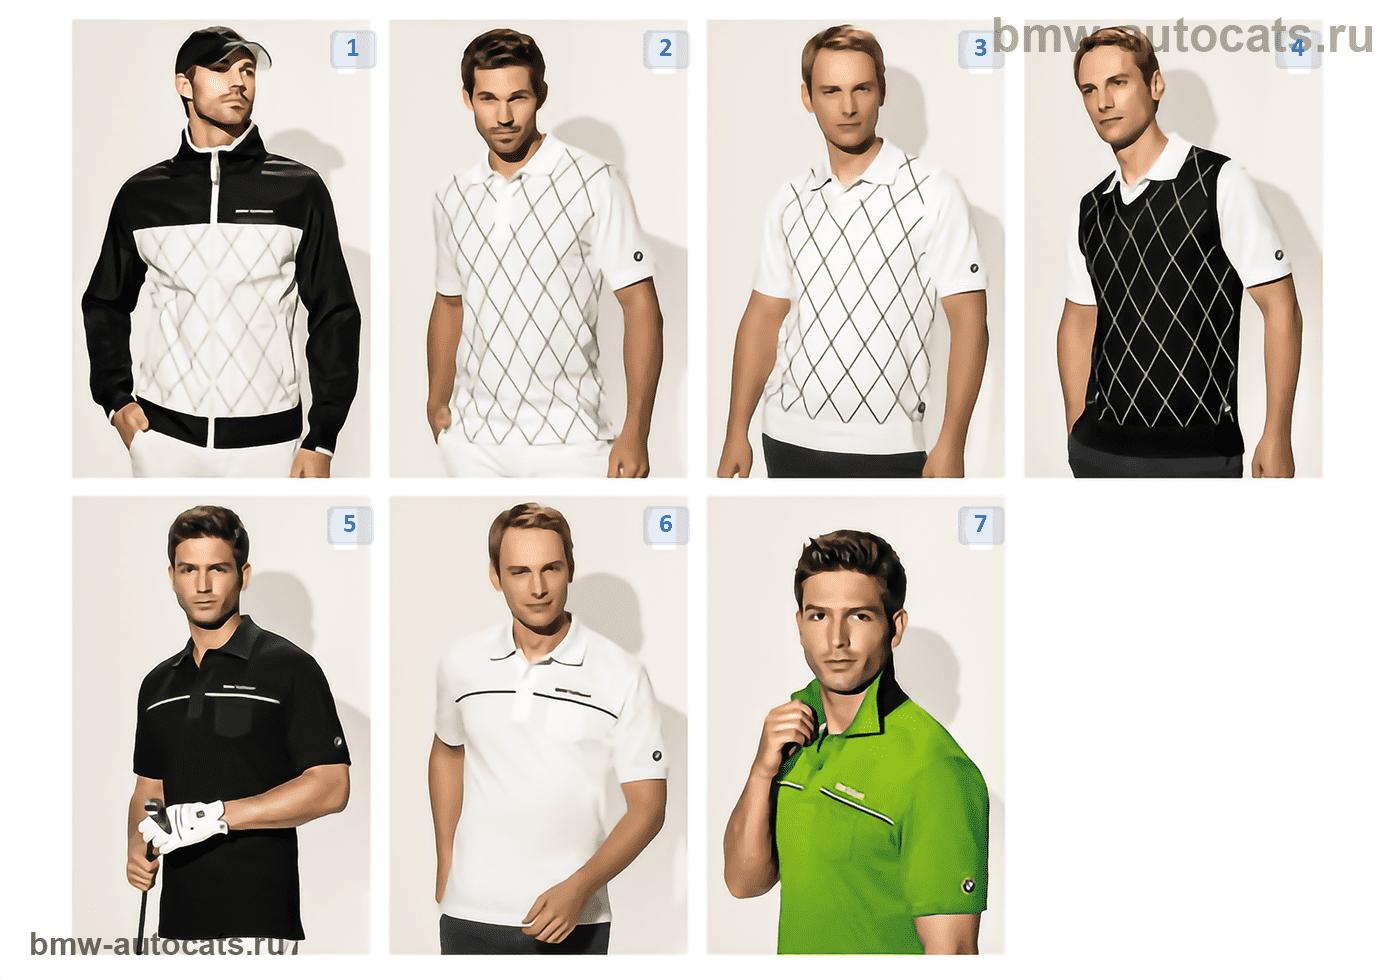 Golfsport — Herrentextilien 2010/11